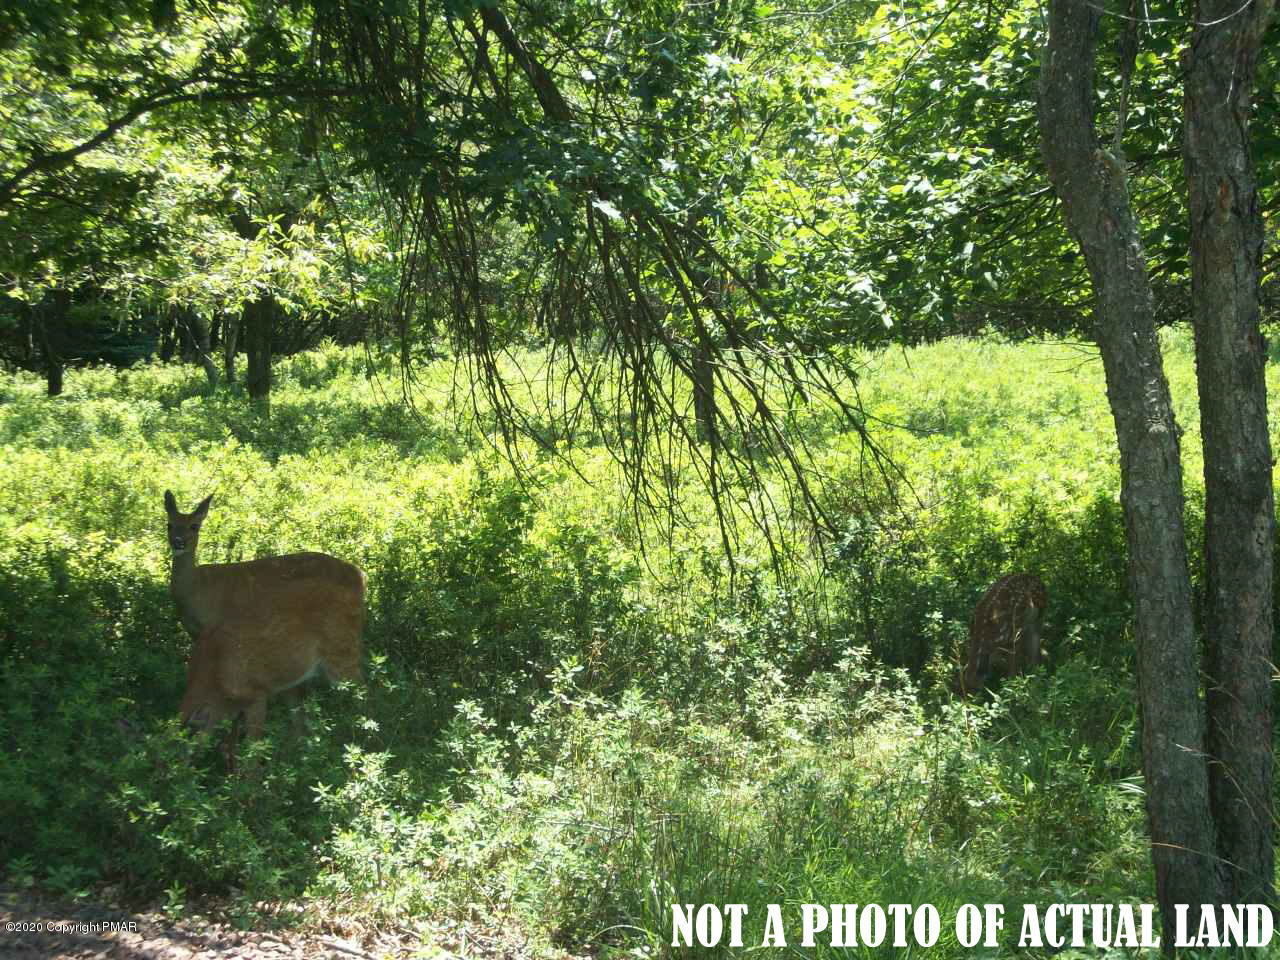 H629 Cross Run Rd, Albrightsville, PA, 18210 United States